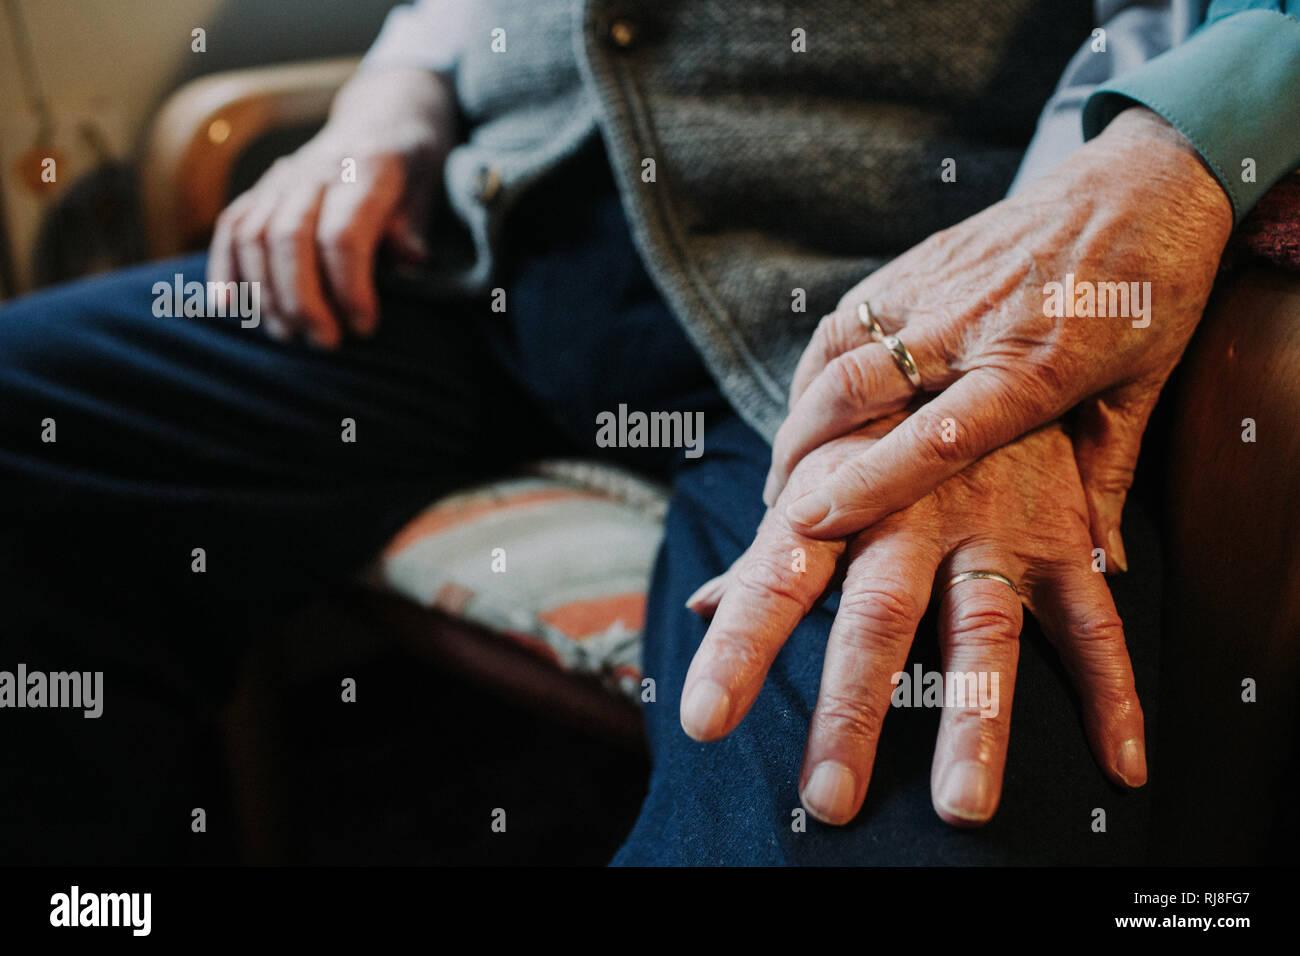 Hände altes Ehepaar mit Ehering - Stock Image